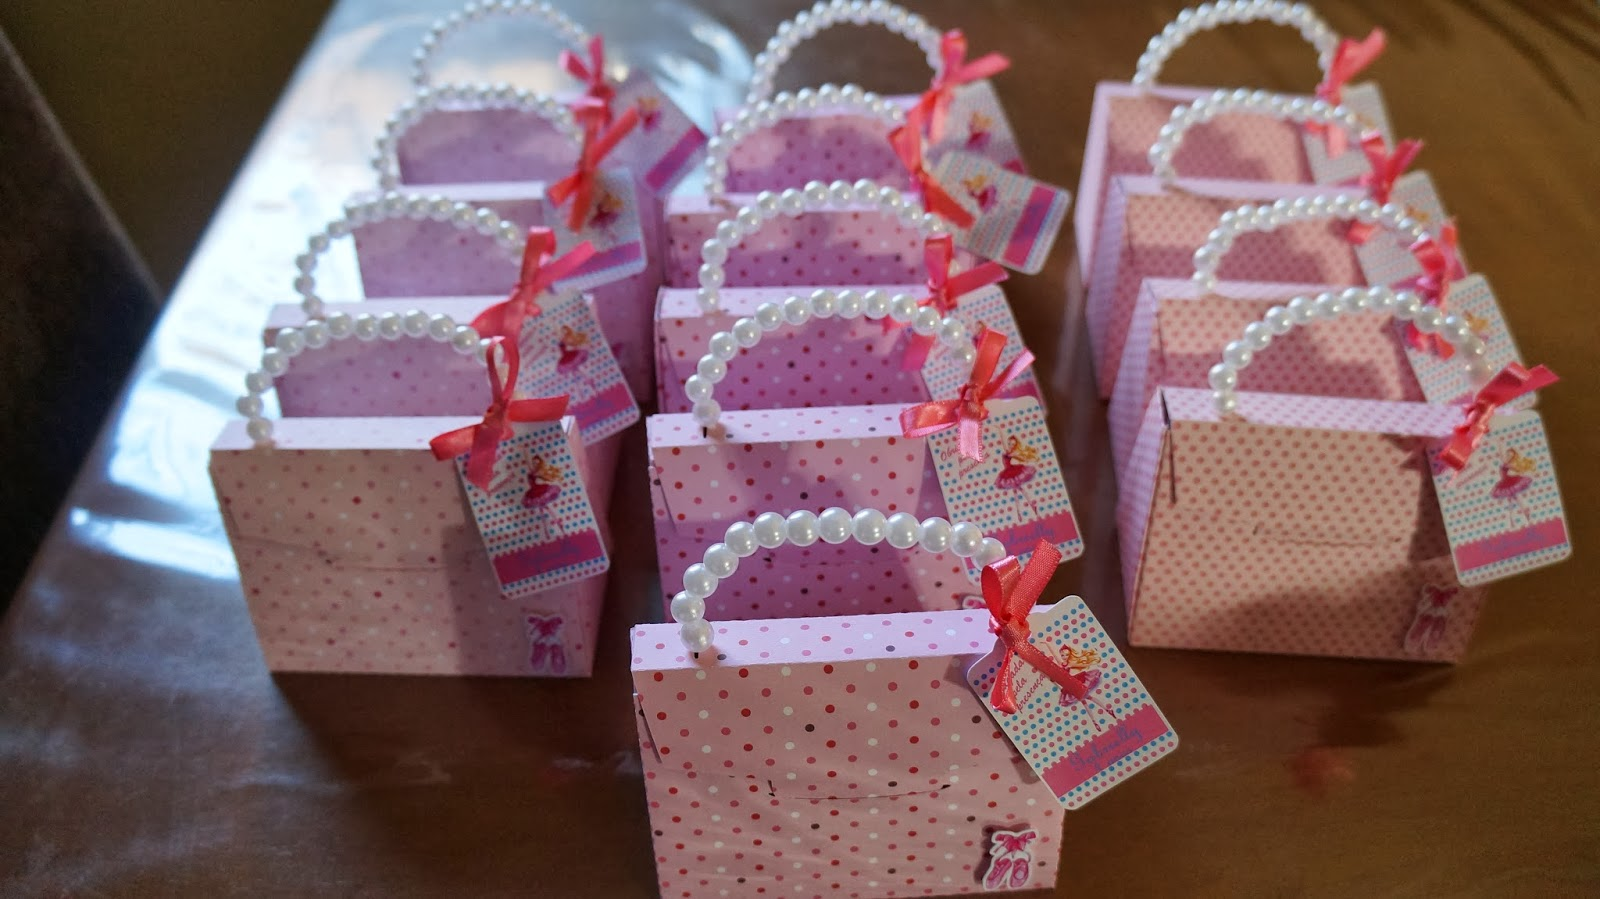 Bolsa De Festa De Aniversario : Lembrancinha festa barbie bailarina ateli? dolce far